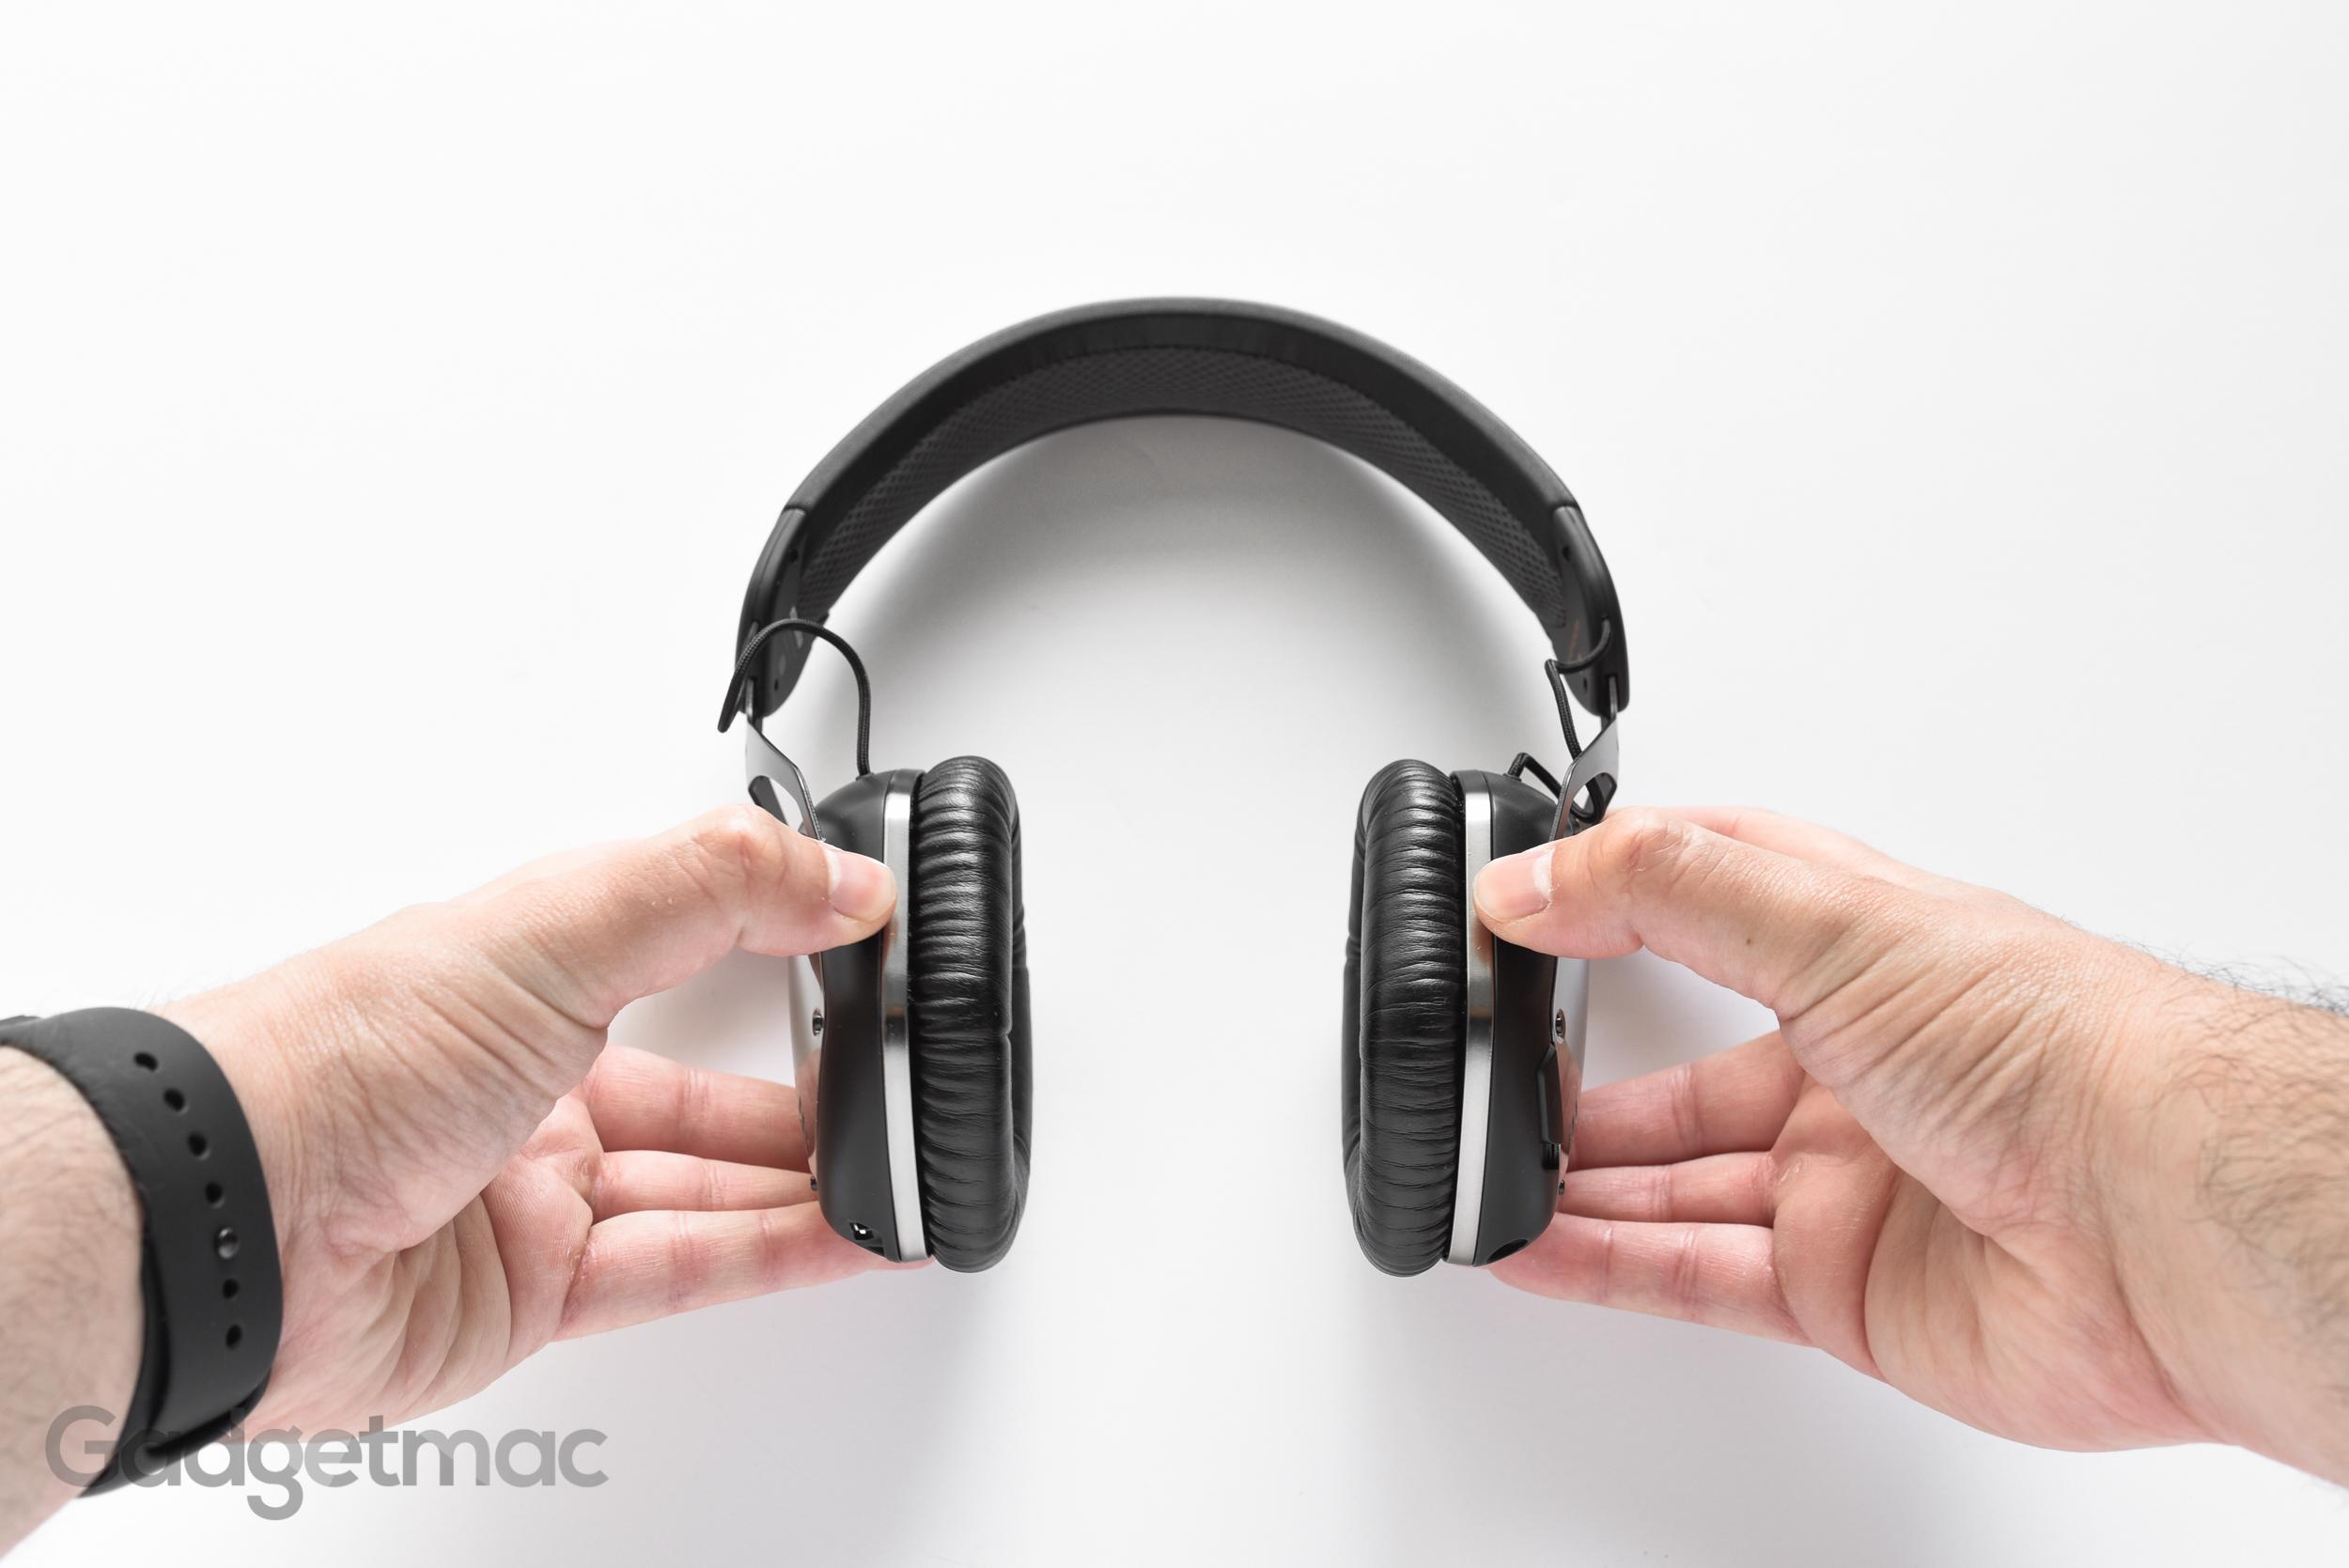 v-moda-crossfade-wireless-headphones-headband.jpg